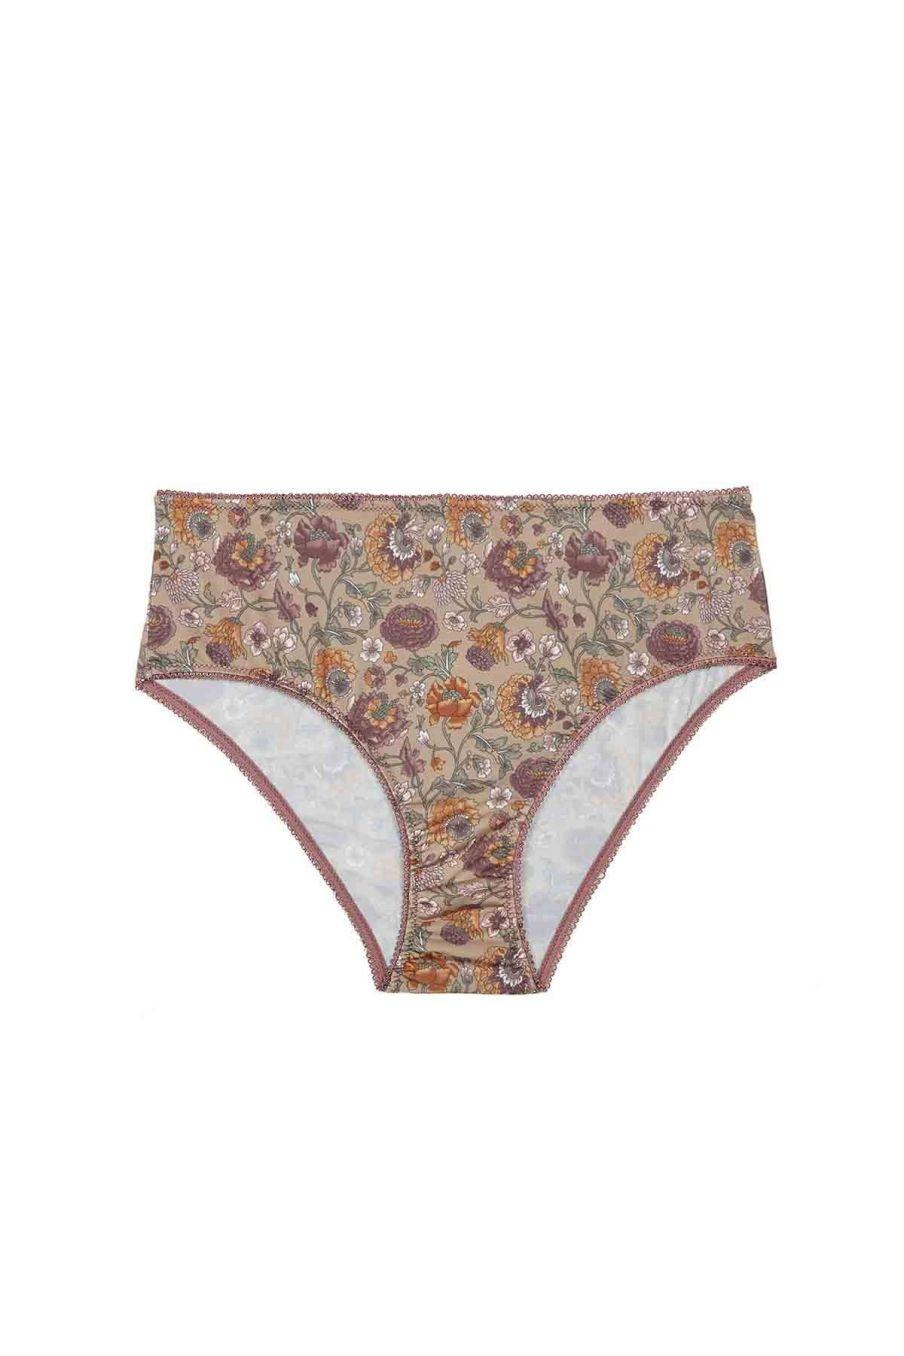 culotte taille haute femme rina sand bohemian flowers - louise misha